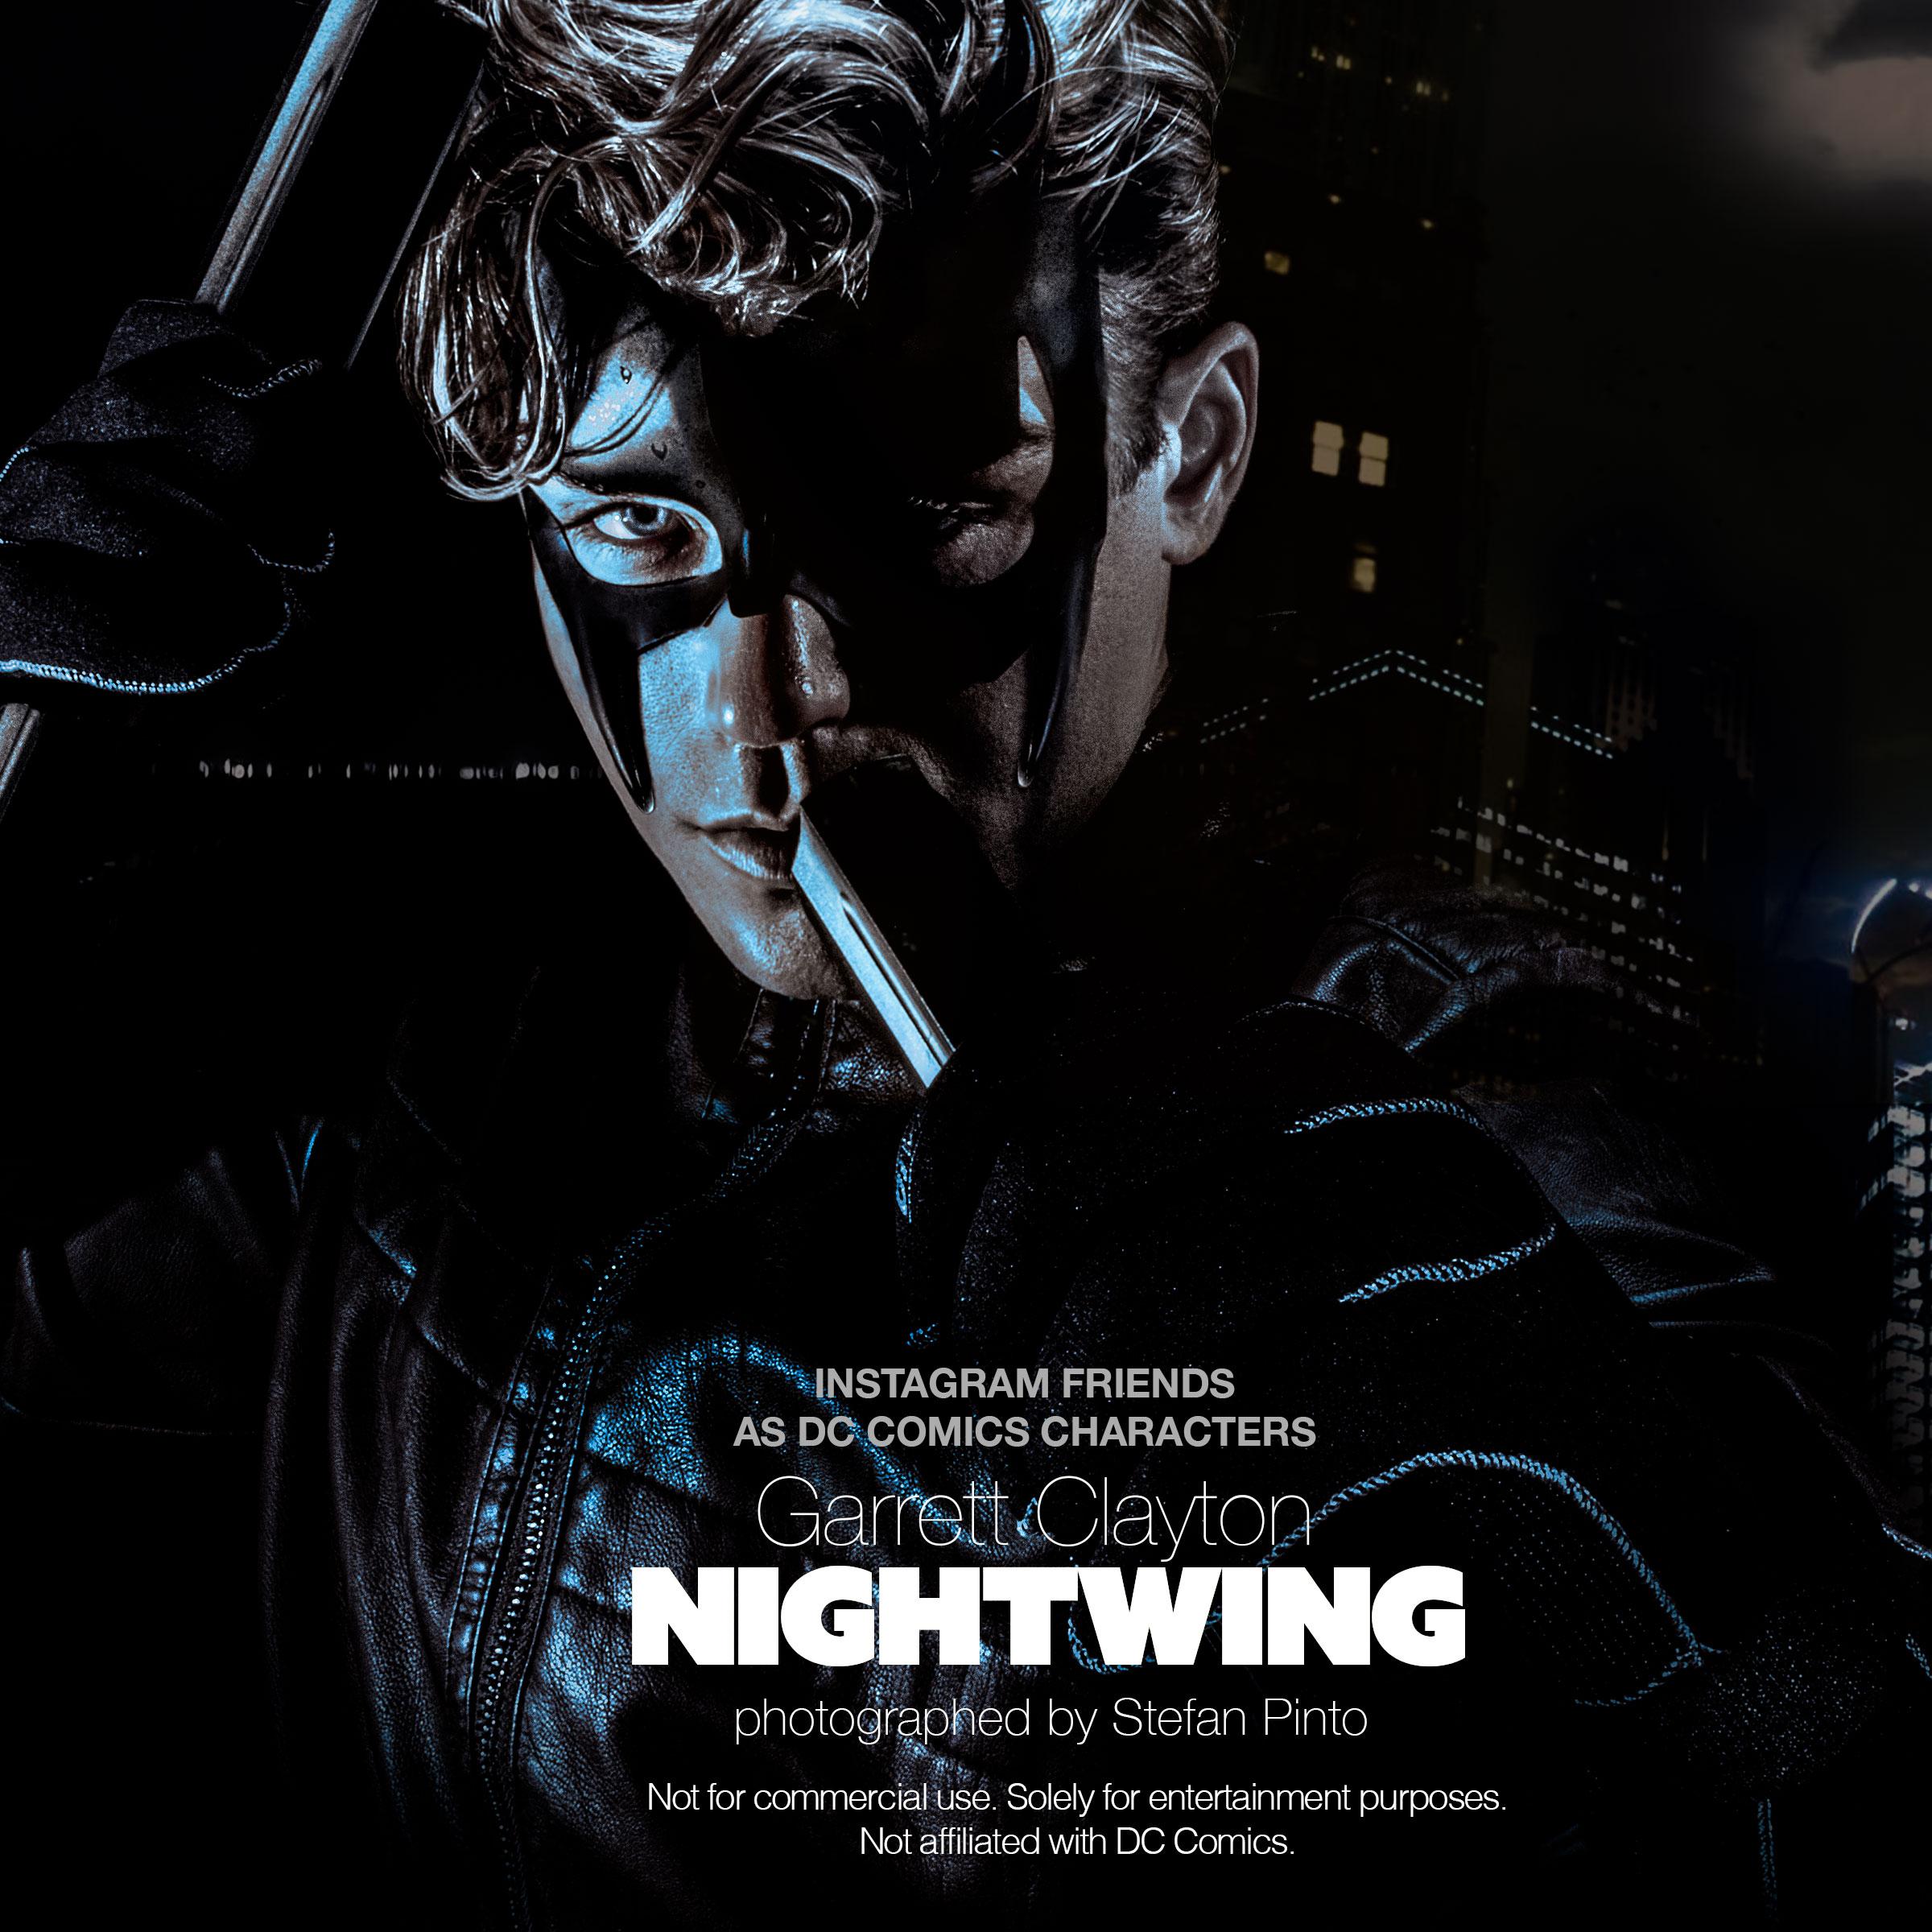 IG_GarrettClayton_Nightwing2.jpg